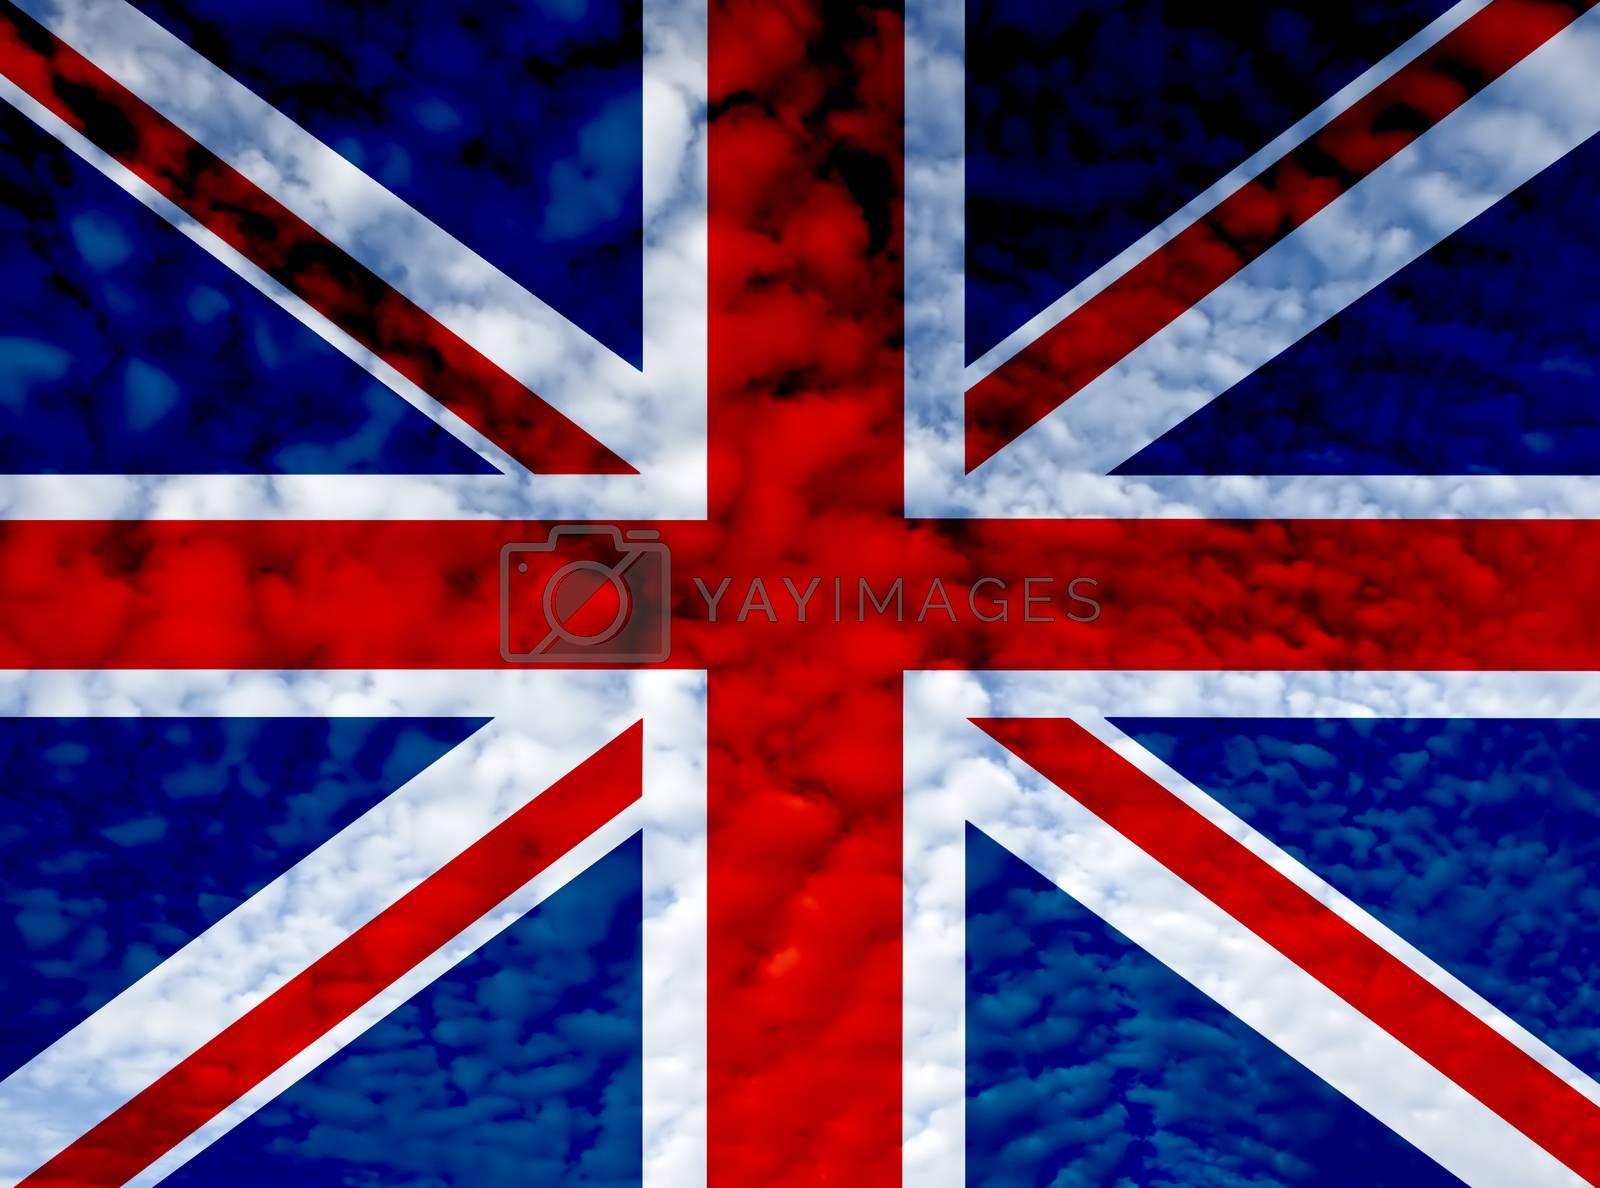 united kingdom england flag ilustration, computer generated